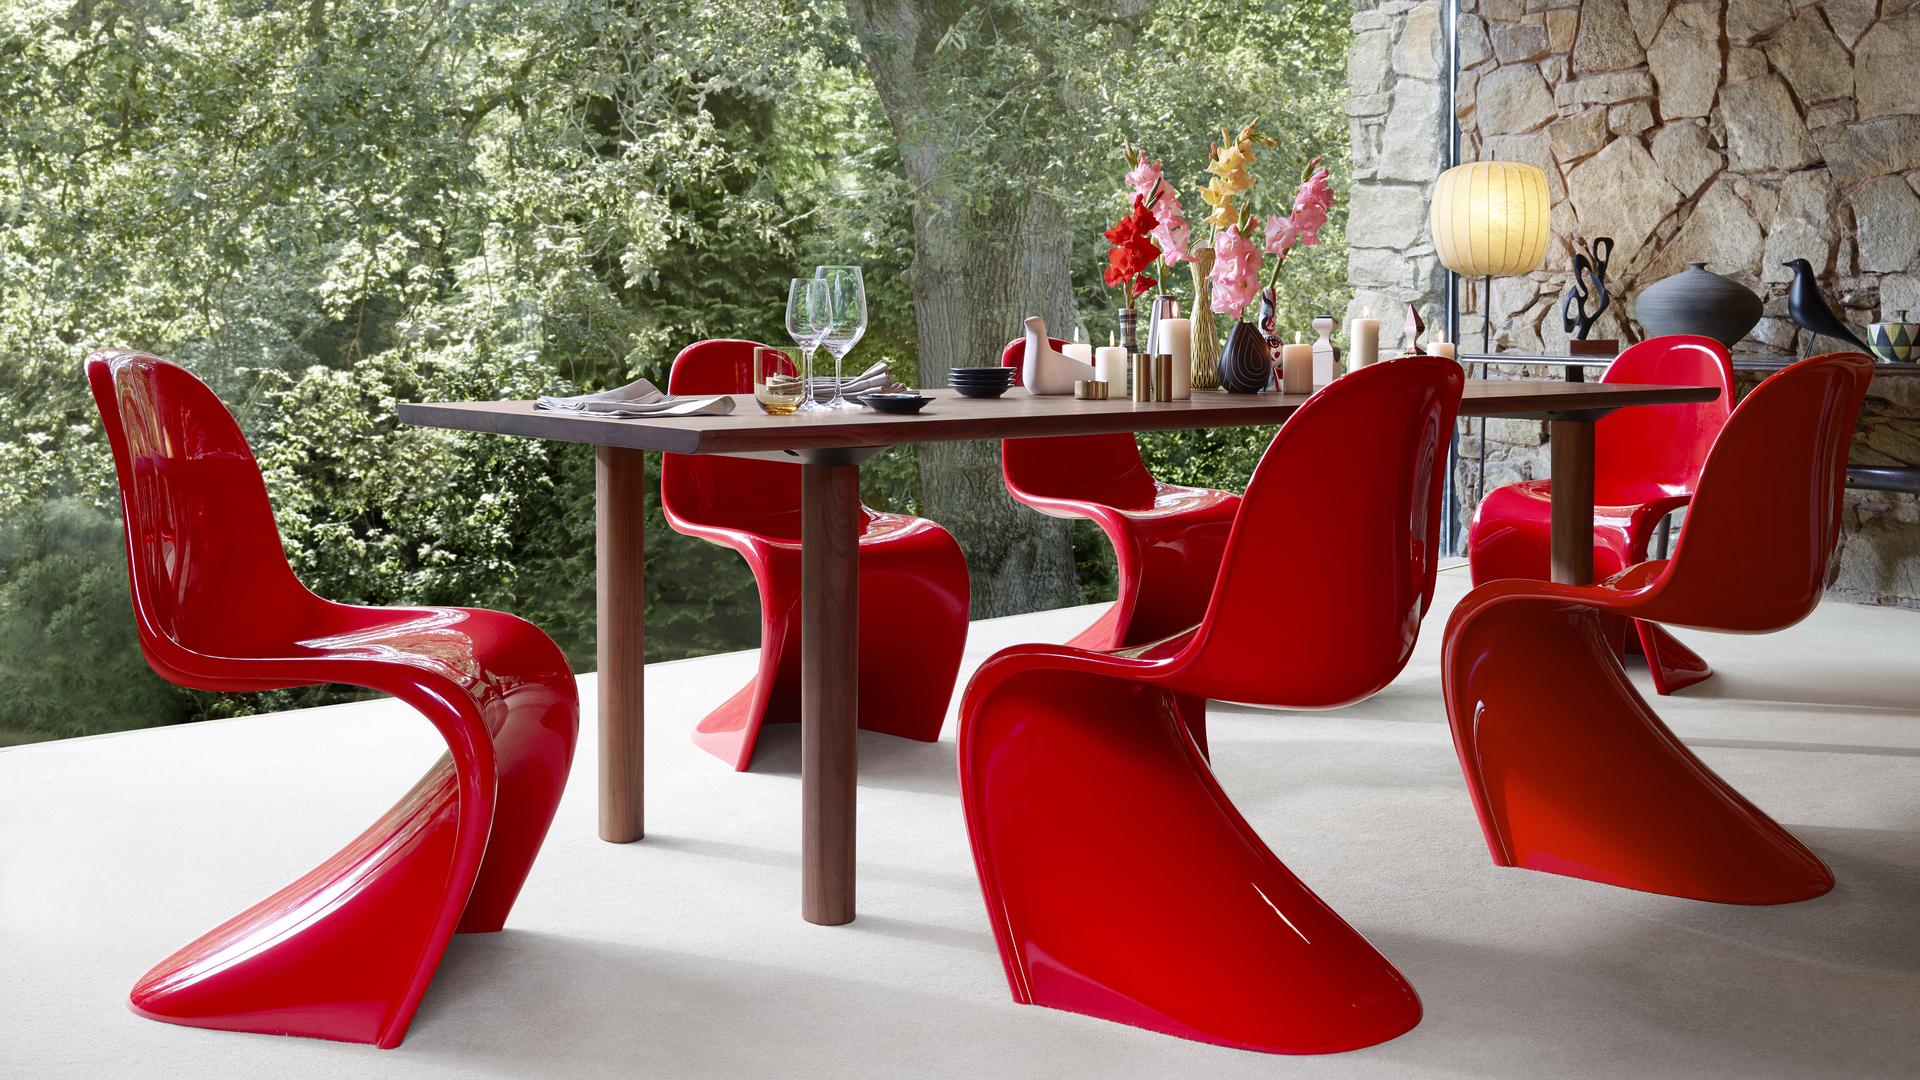 ae2462a0b54e Vitra Panton Chair Classic Designer Contemporary furniture